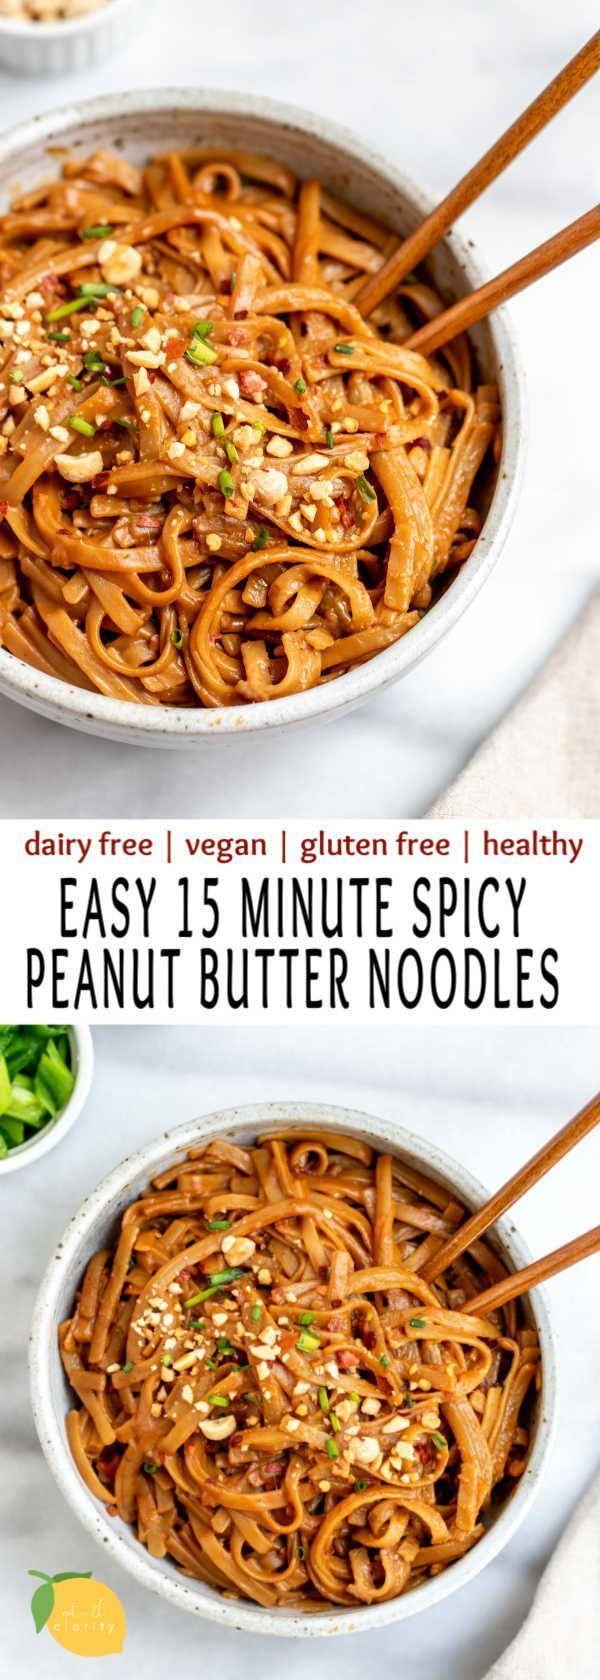 15 Minute Spicy Peanut Butter Noodles -   - #butter #HealthyVegetableSoups #minute #noodles #peanut #spicy #VeganRecipes #VegetarianRecipe #dinnerrecipes #ketorecipes